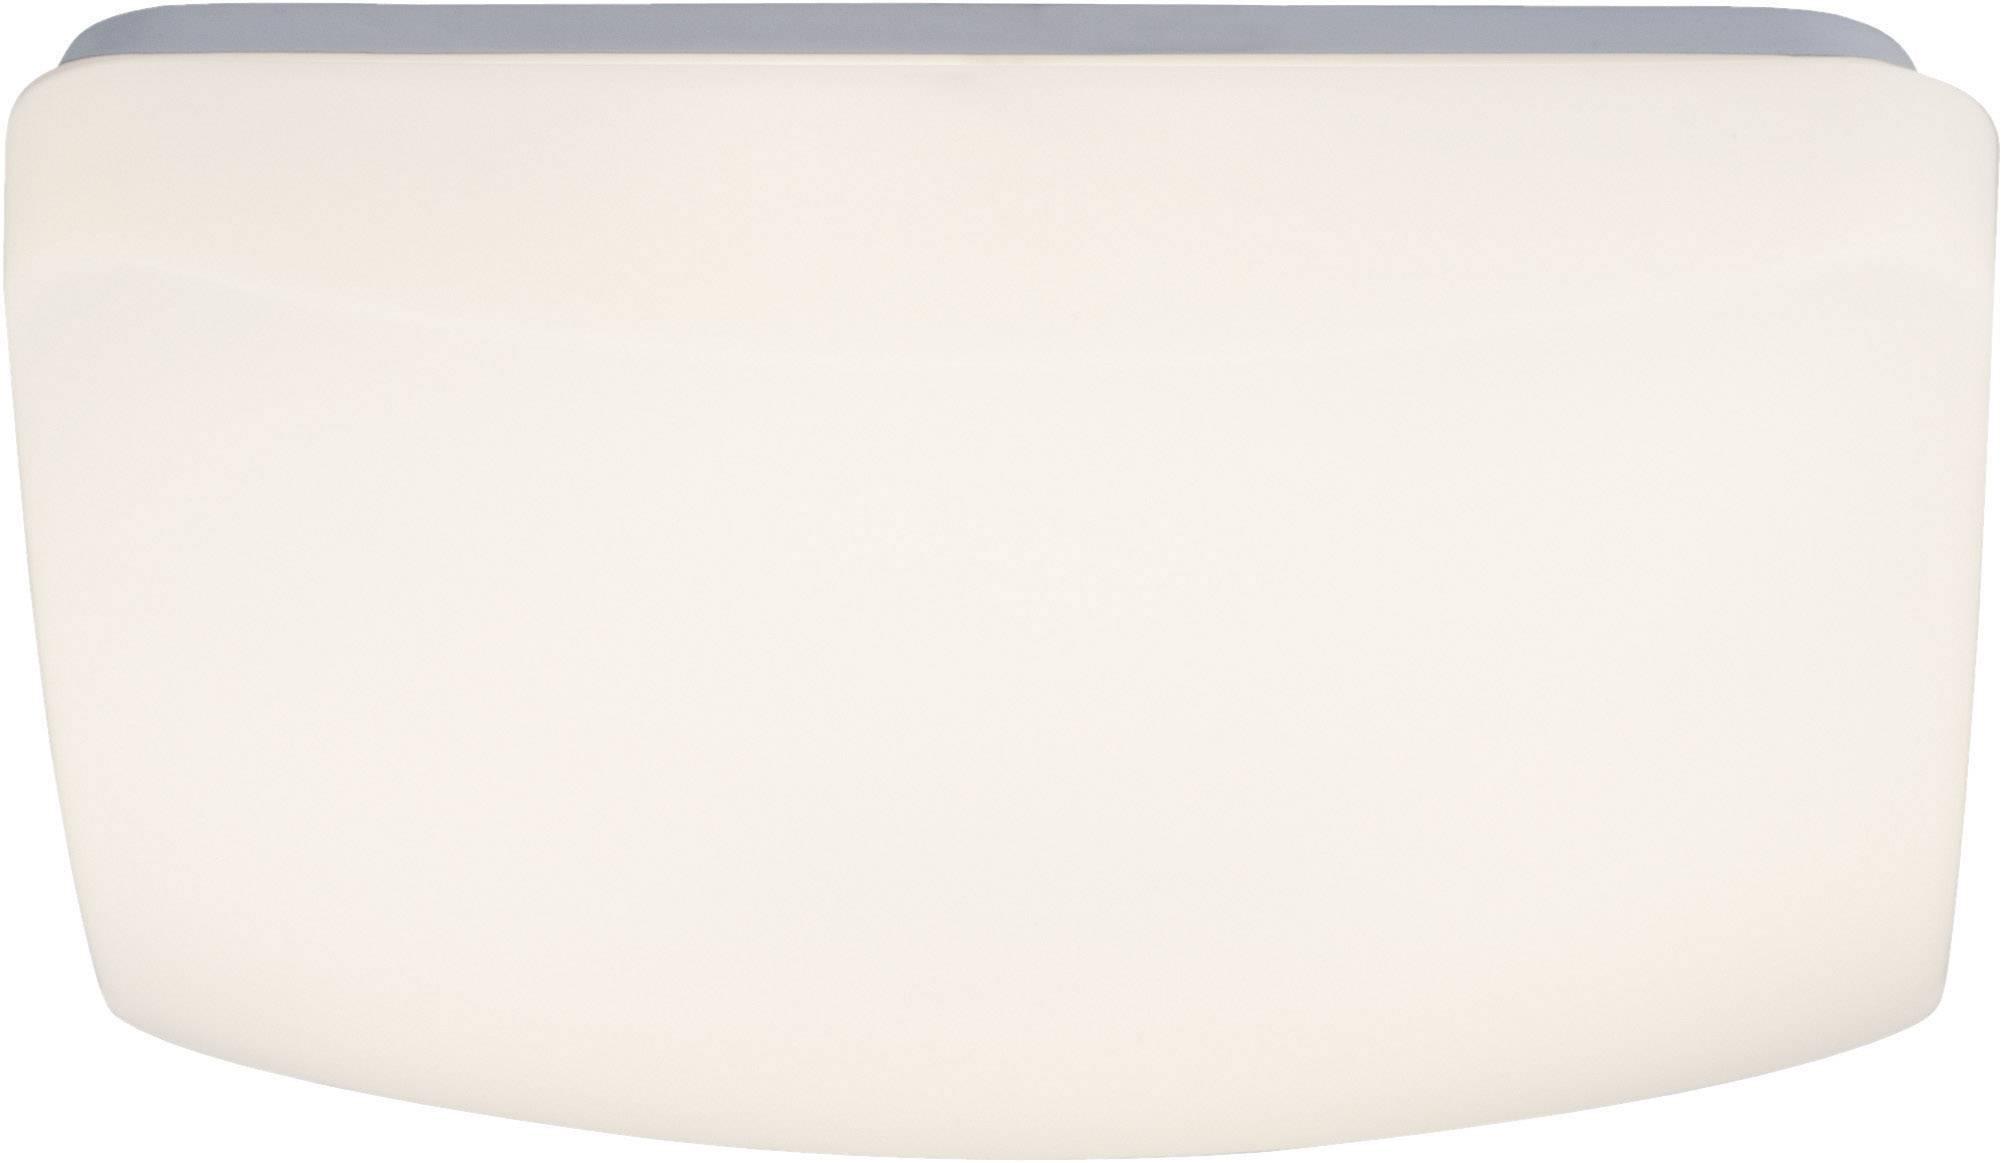 LED stropné svietidlo Brilliant Vigor G94158/05, 12 W, teplá biela, biela